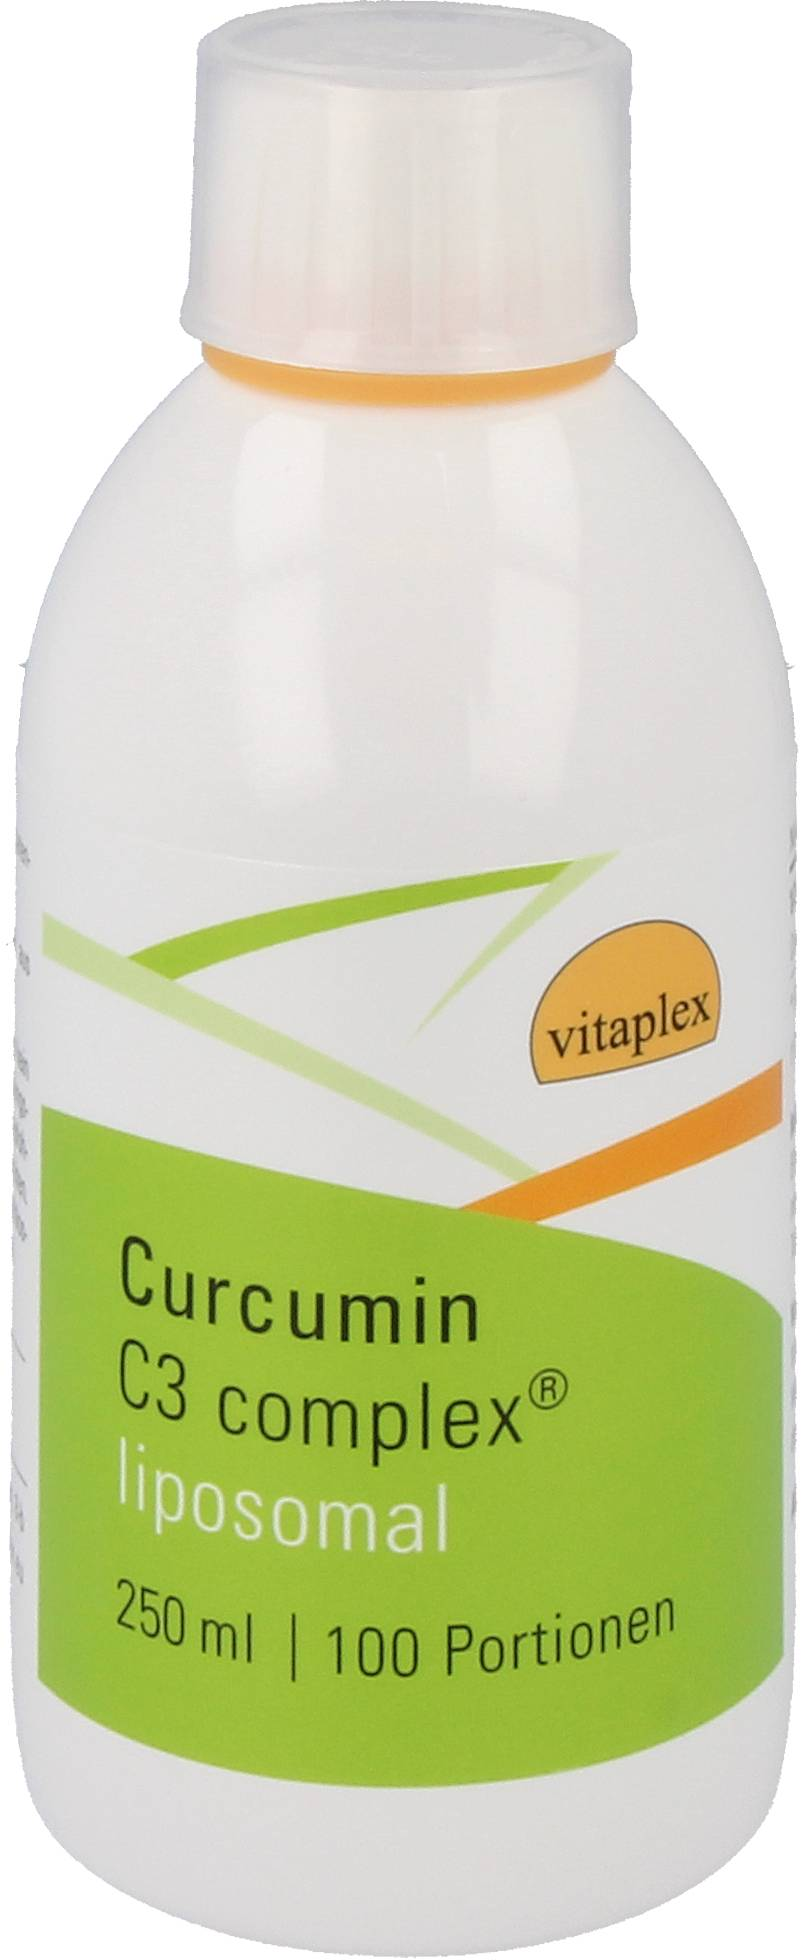 Vitaplex La curcumine C3 complexe liposomal (250 ml) - Vitaplex